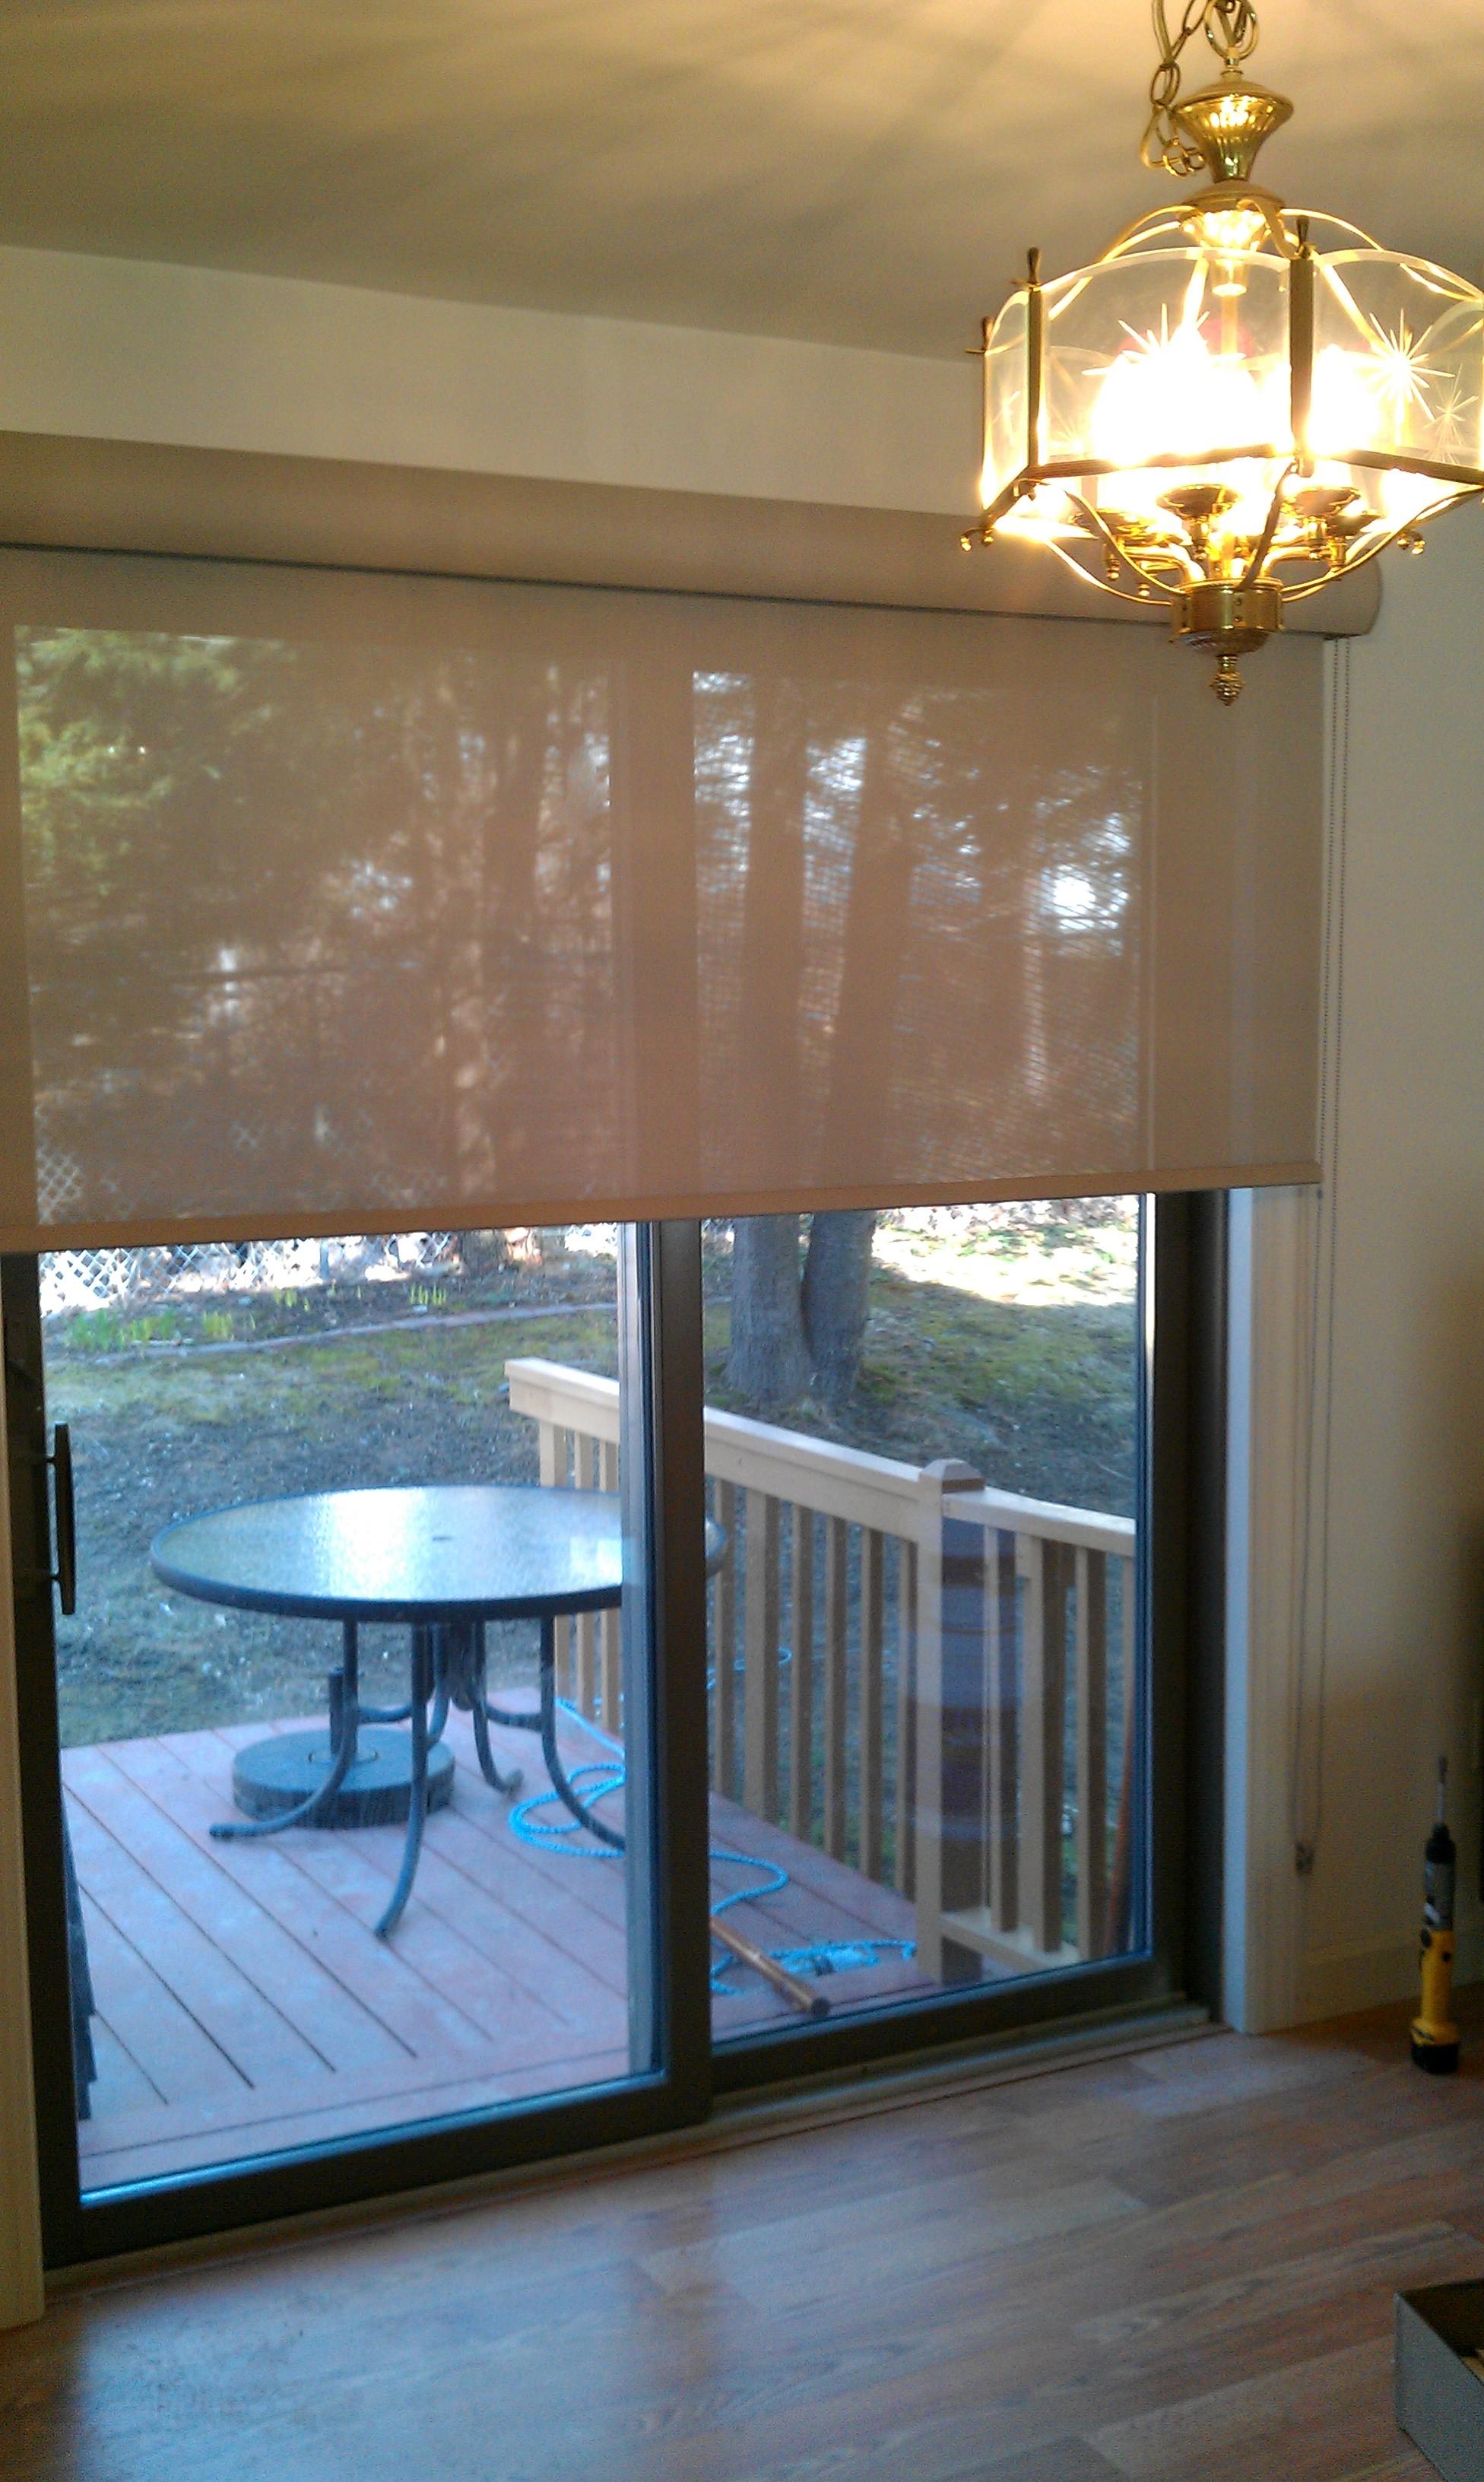 Solar Shades For Sliding Patio Doorssolar roller shade on a sliding door sliders and patio door